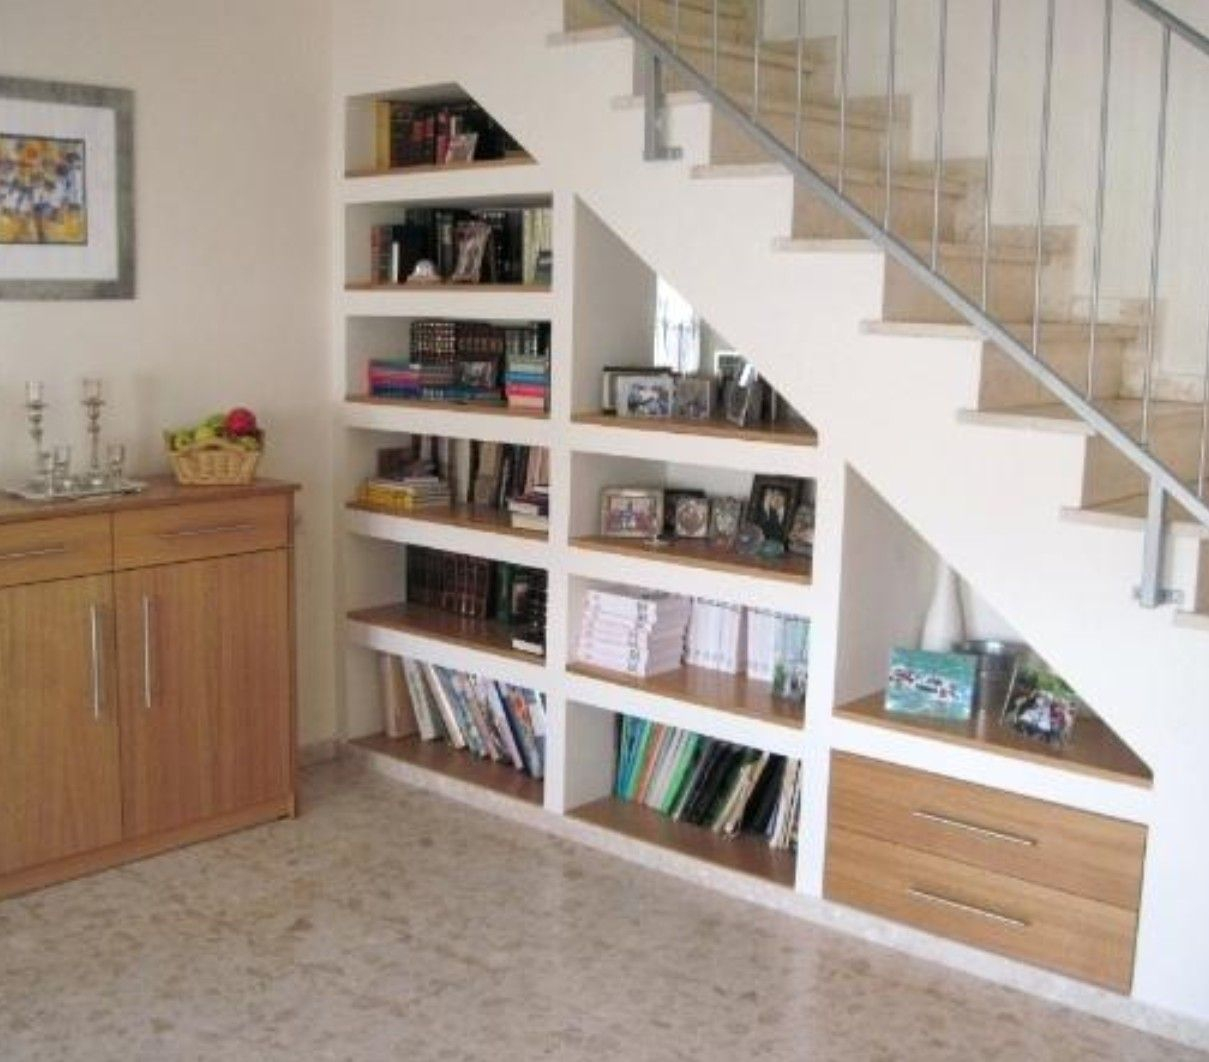 Pin Lofly On Hallway Stair Bookshelf Under Basement within size 1209 X 1062